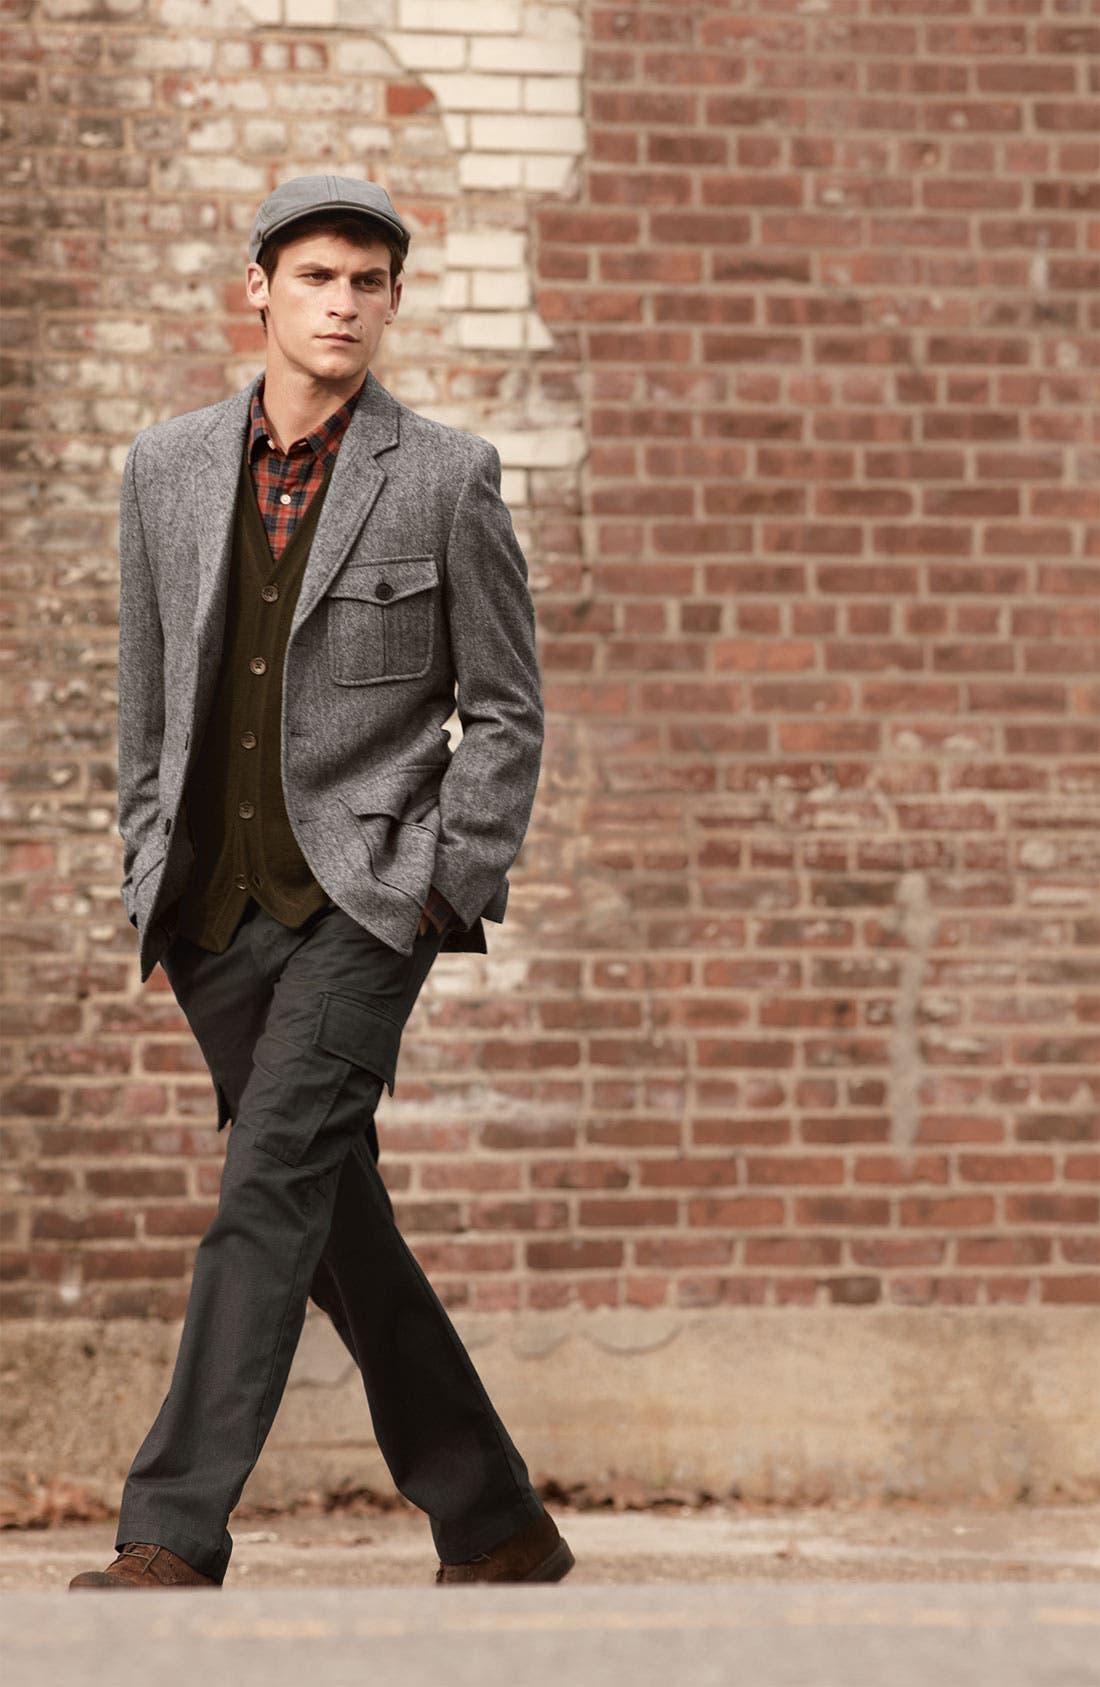 Alternate Image 1 Selected - Wallin & Bros. Sportcoat, Vest & Cargo Pants